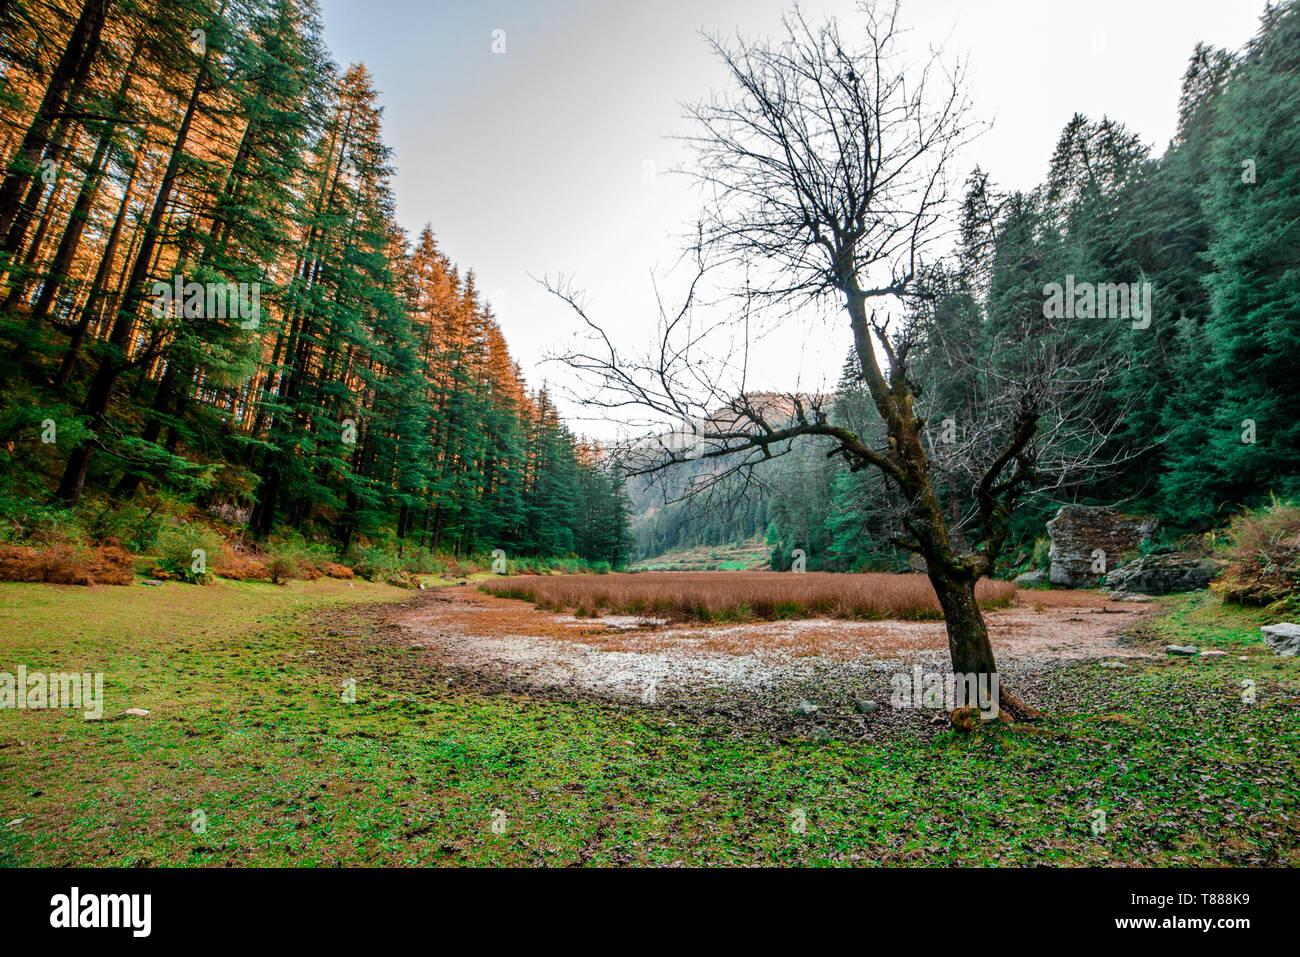 Autumn - Beautiful deodar forest in Manali, Himachal Pradesh, India - - Stock Image